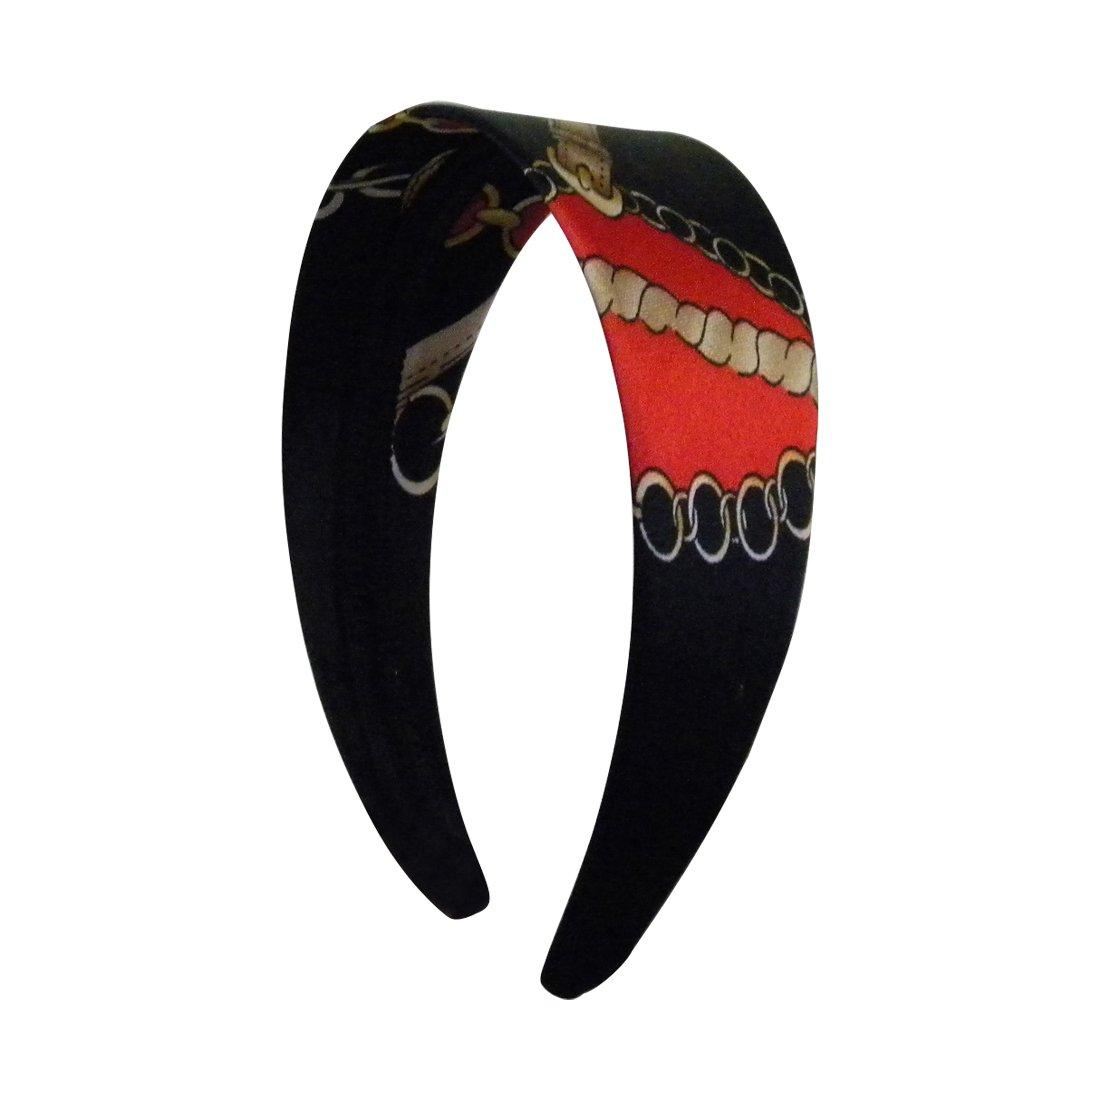 2 Inch Satin Headband with Gold Chain Design